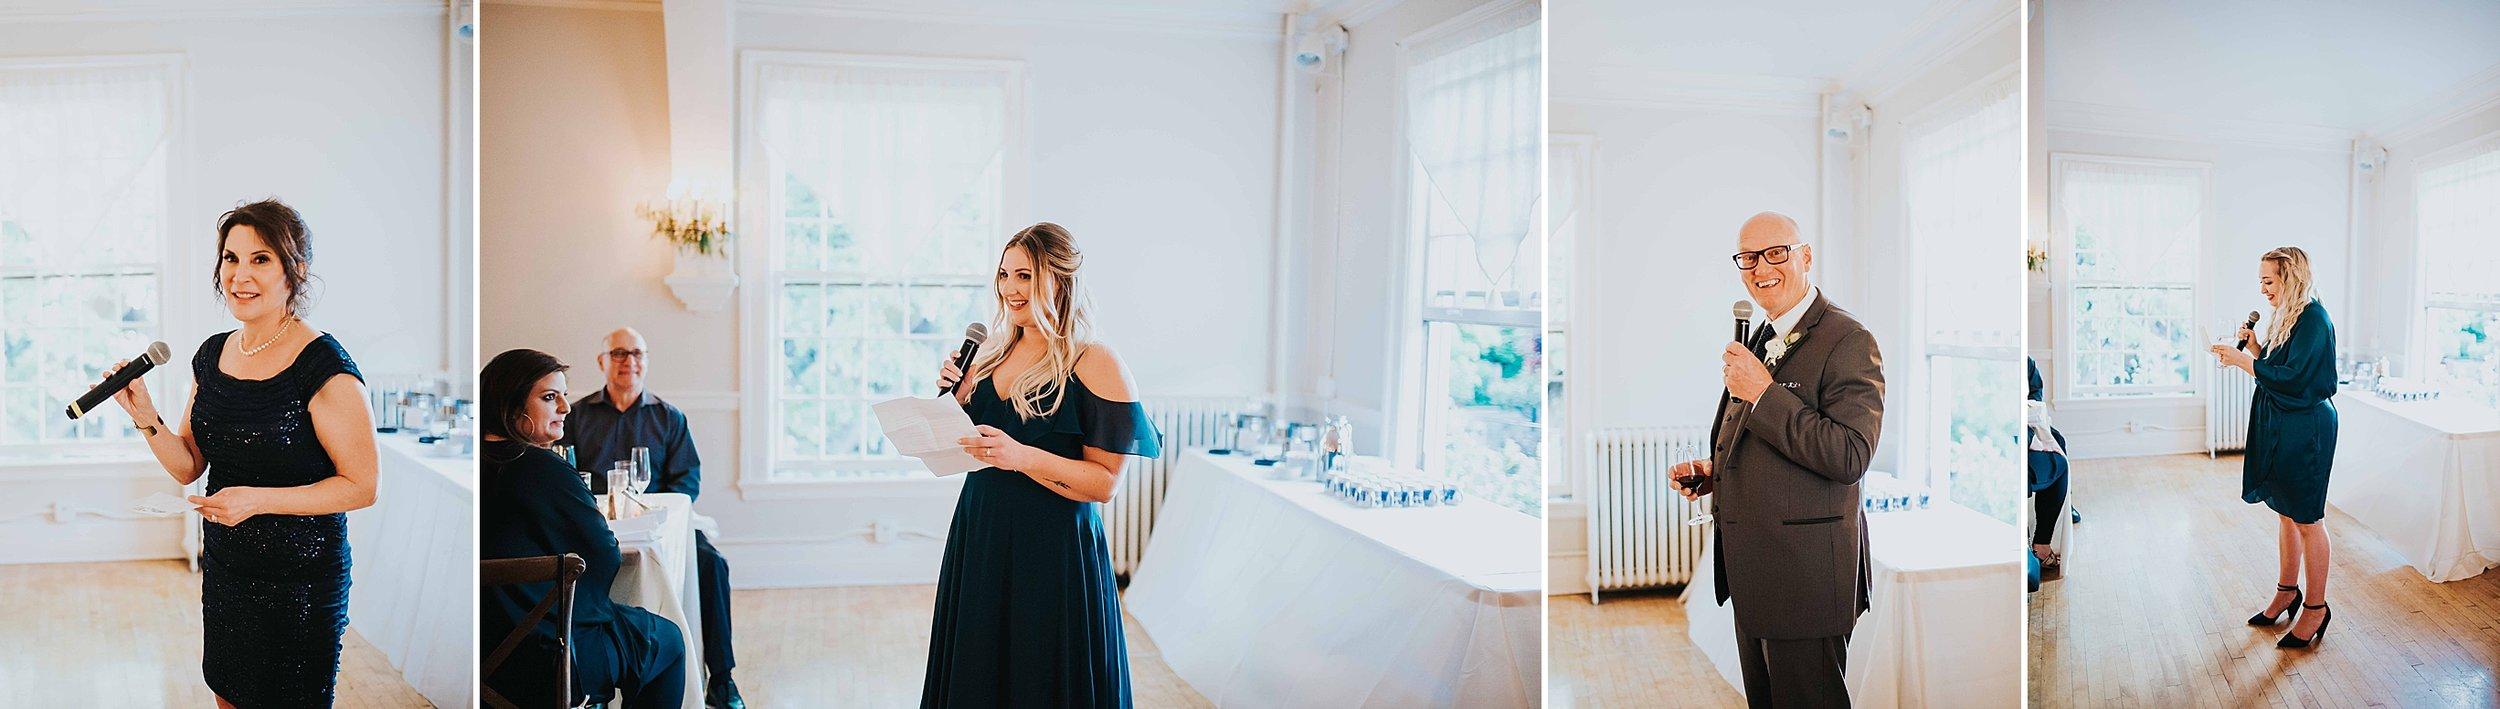 Seattle-Wedding-photographer-J HODGES PHOTOGRAPHY_0330.jpg